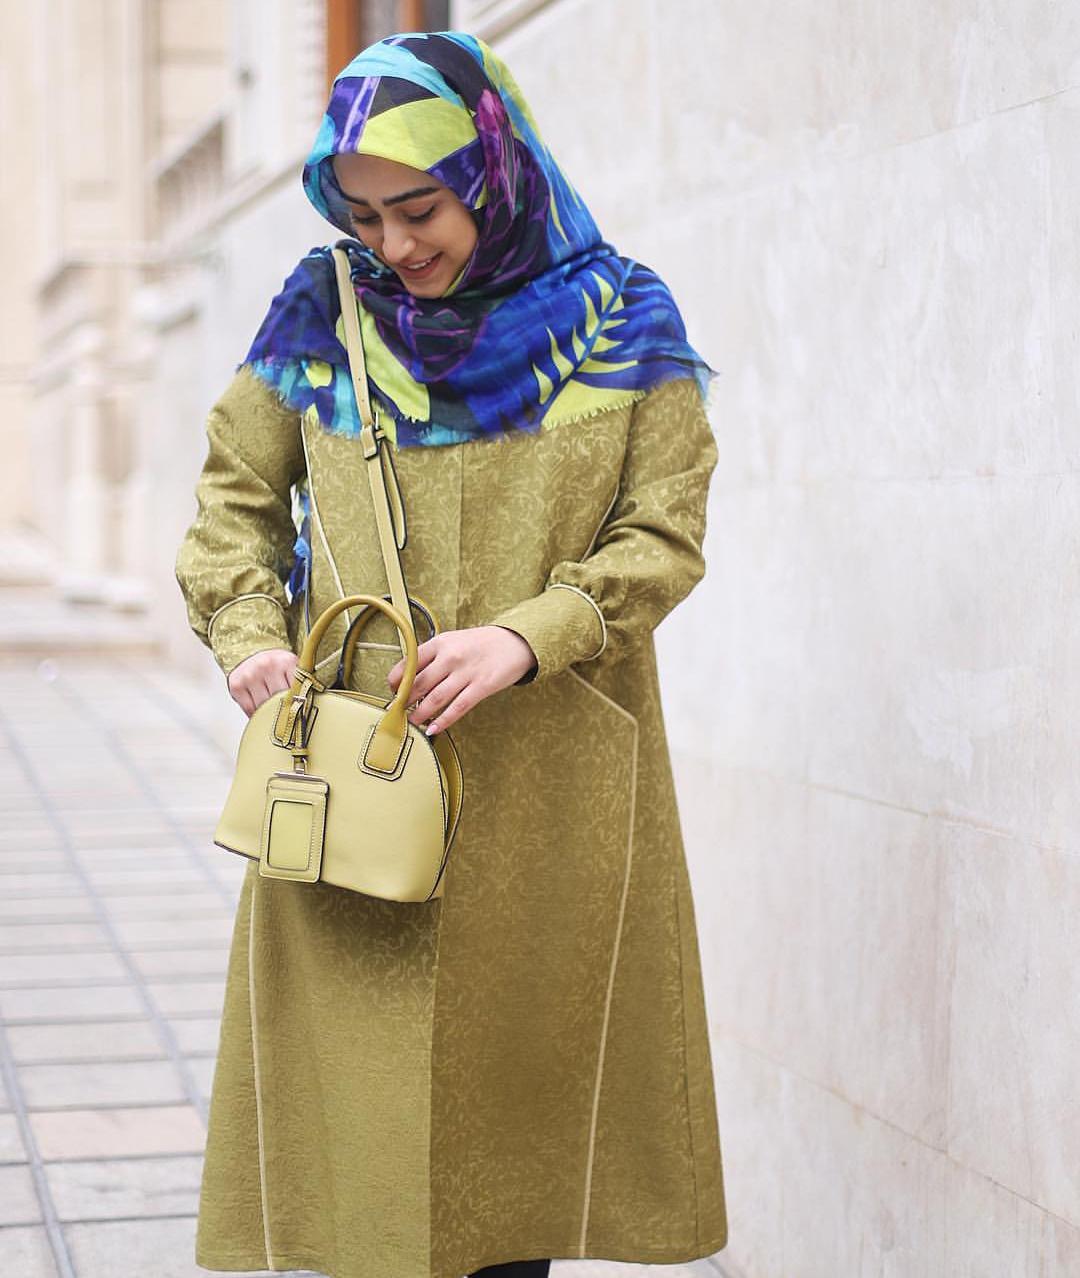 حجاب-زیبا-مانتو-روسری3